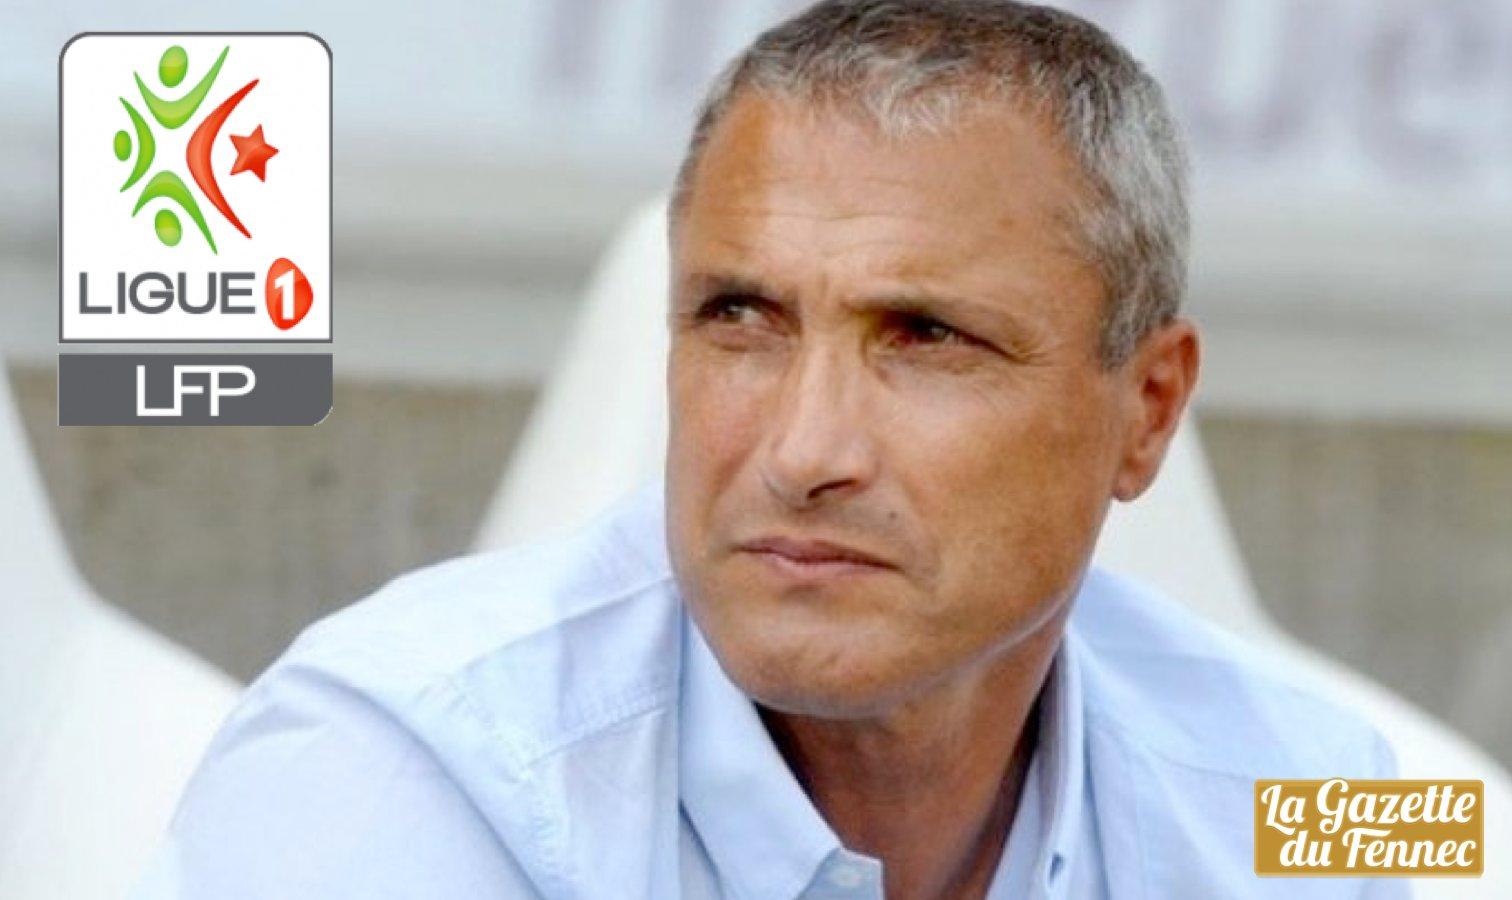 casoni coach